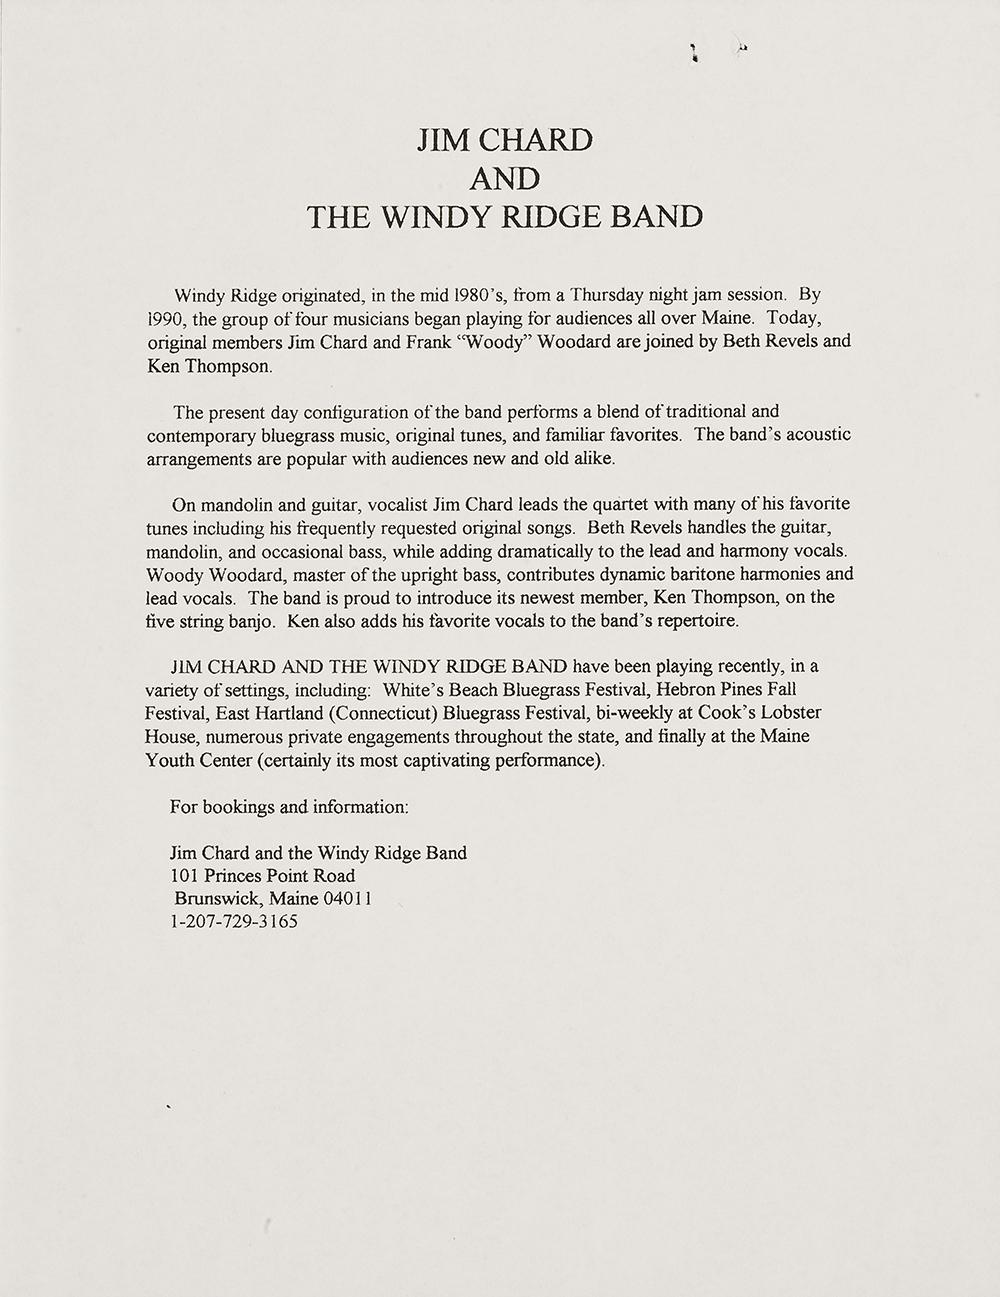 BIOG-0034, Jim Chard And The Windy Ridge Band